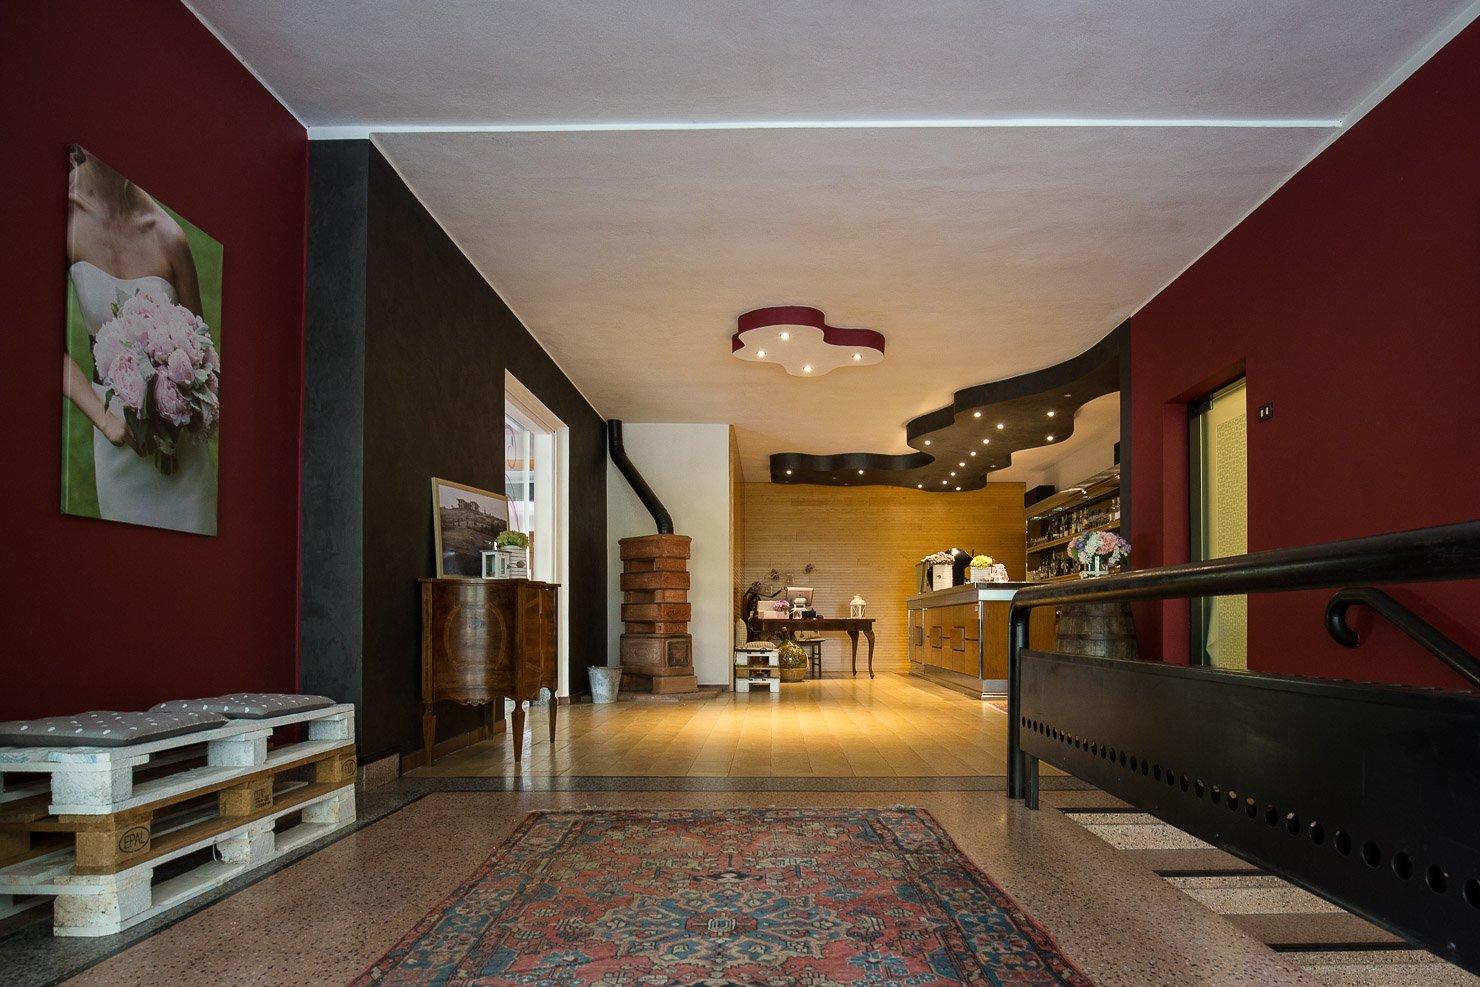 Fotografia d'interni - Fotografo Verona